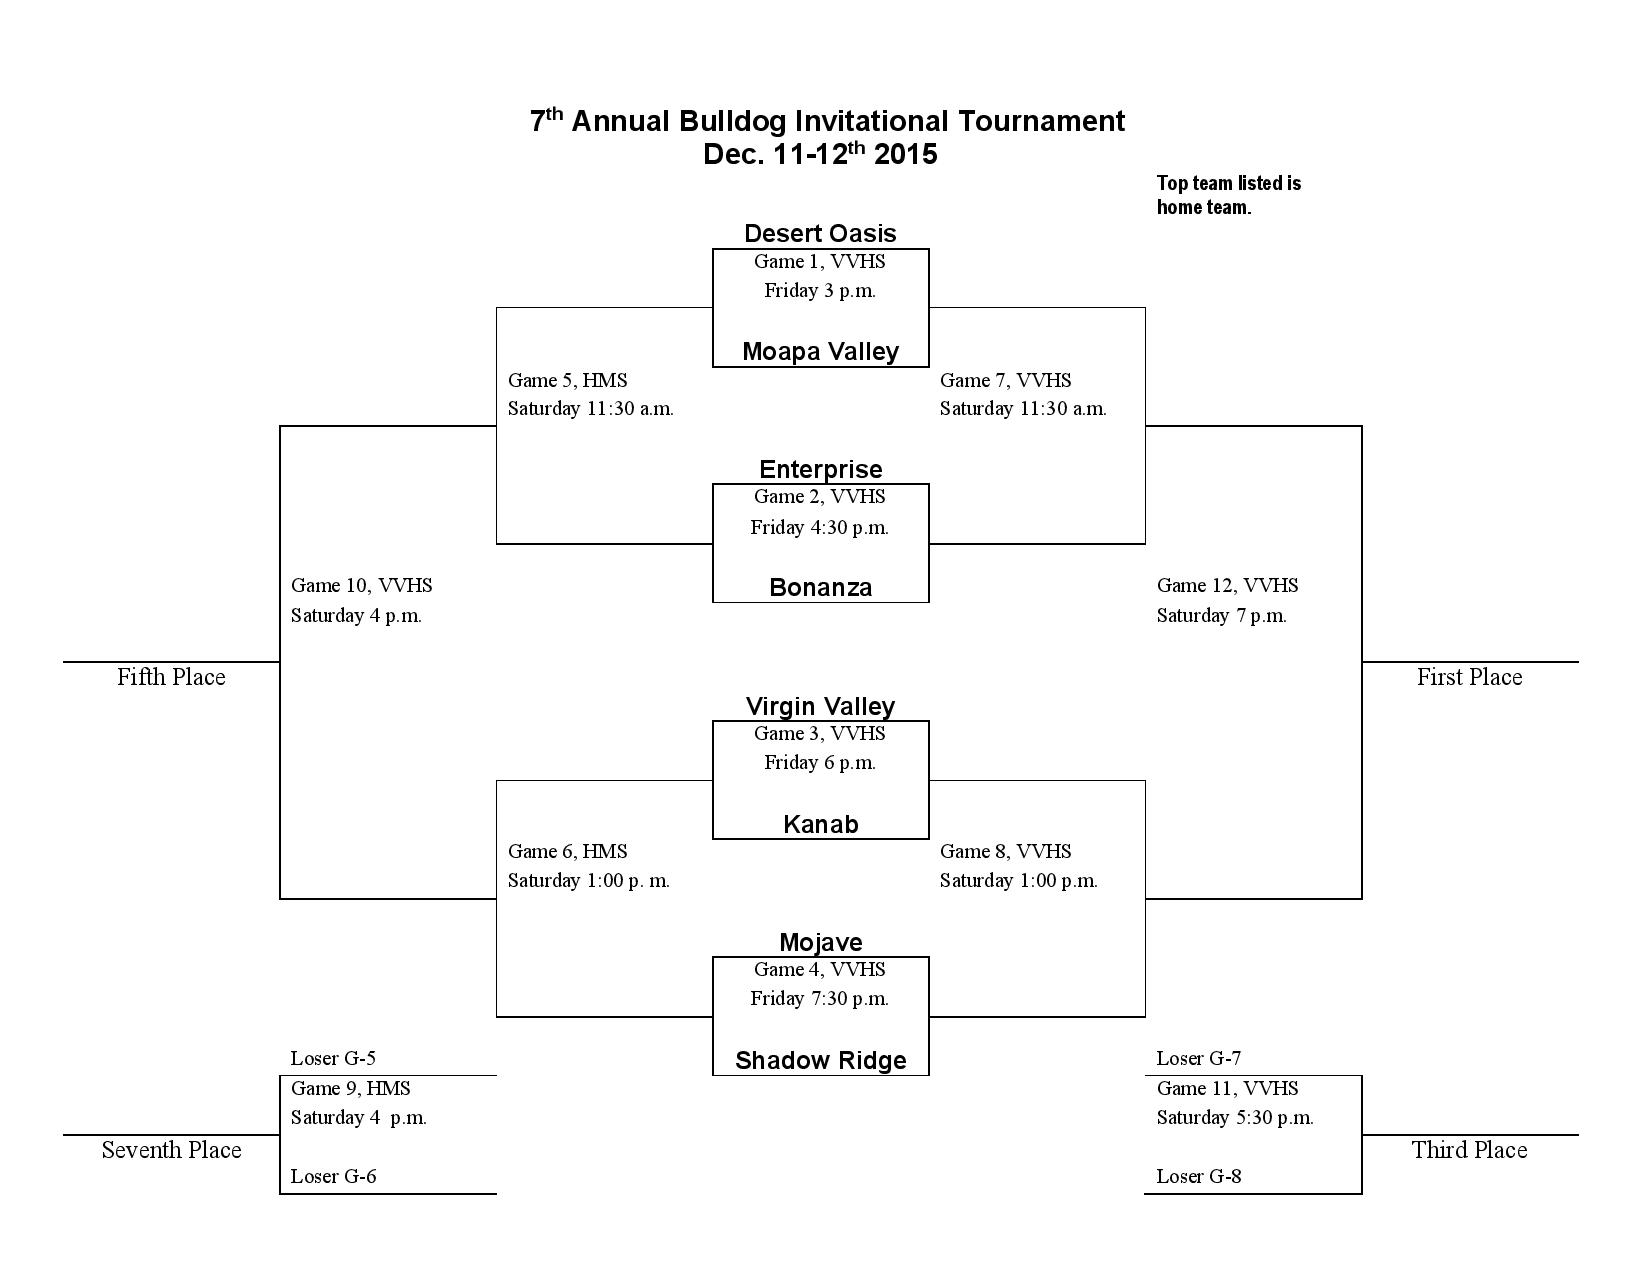 Dawgs to host Bulldog Invitational Tournament (BIT) this weekend